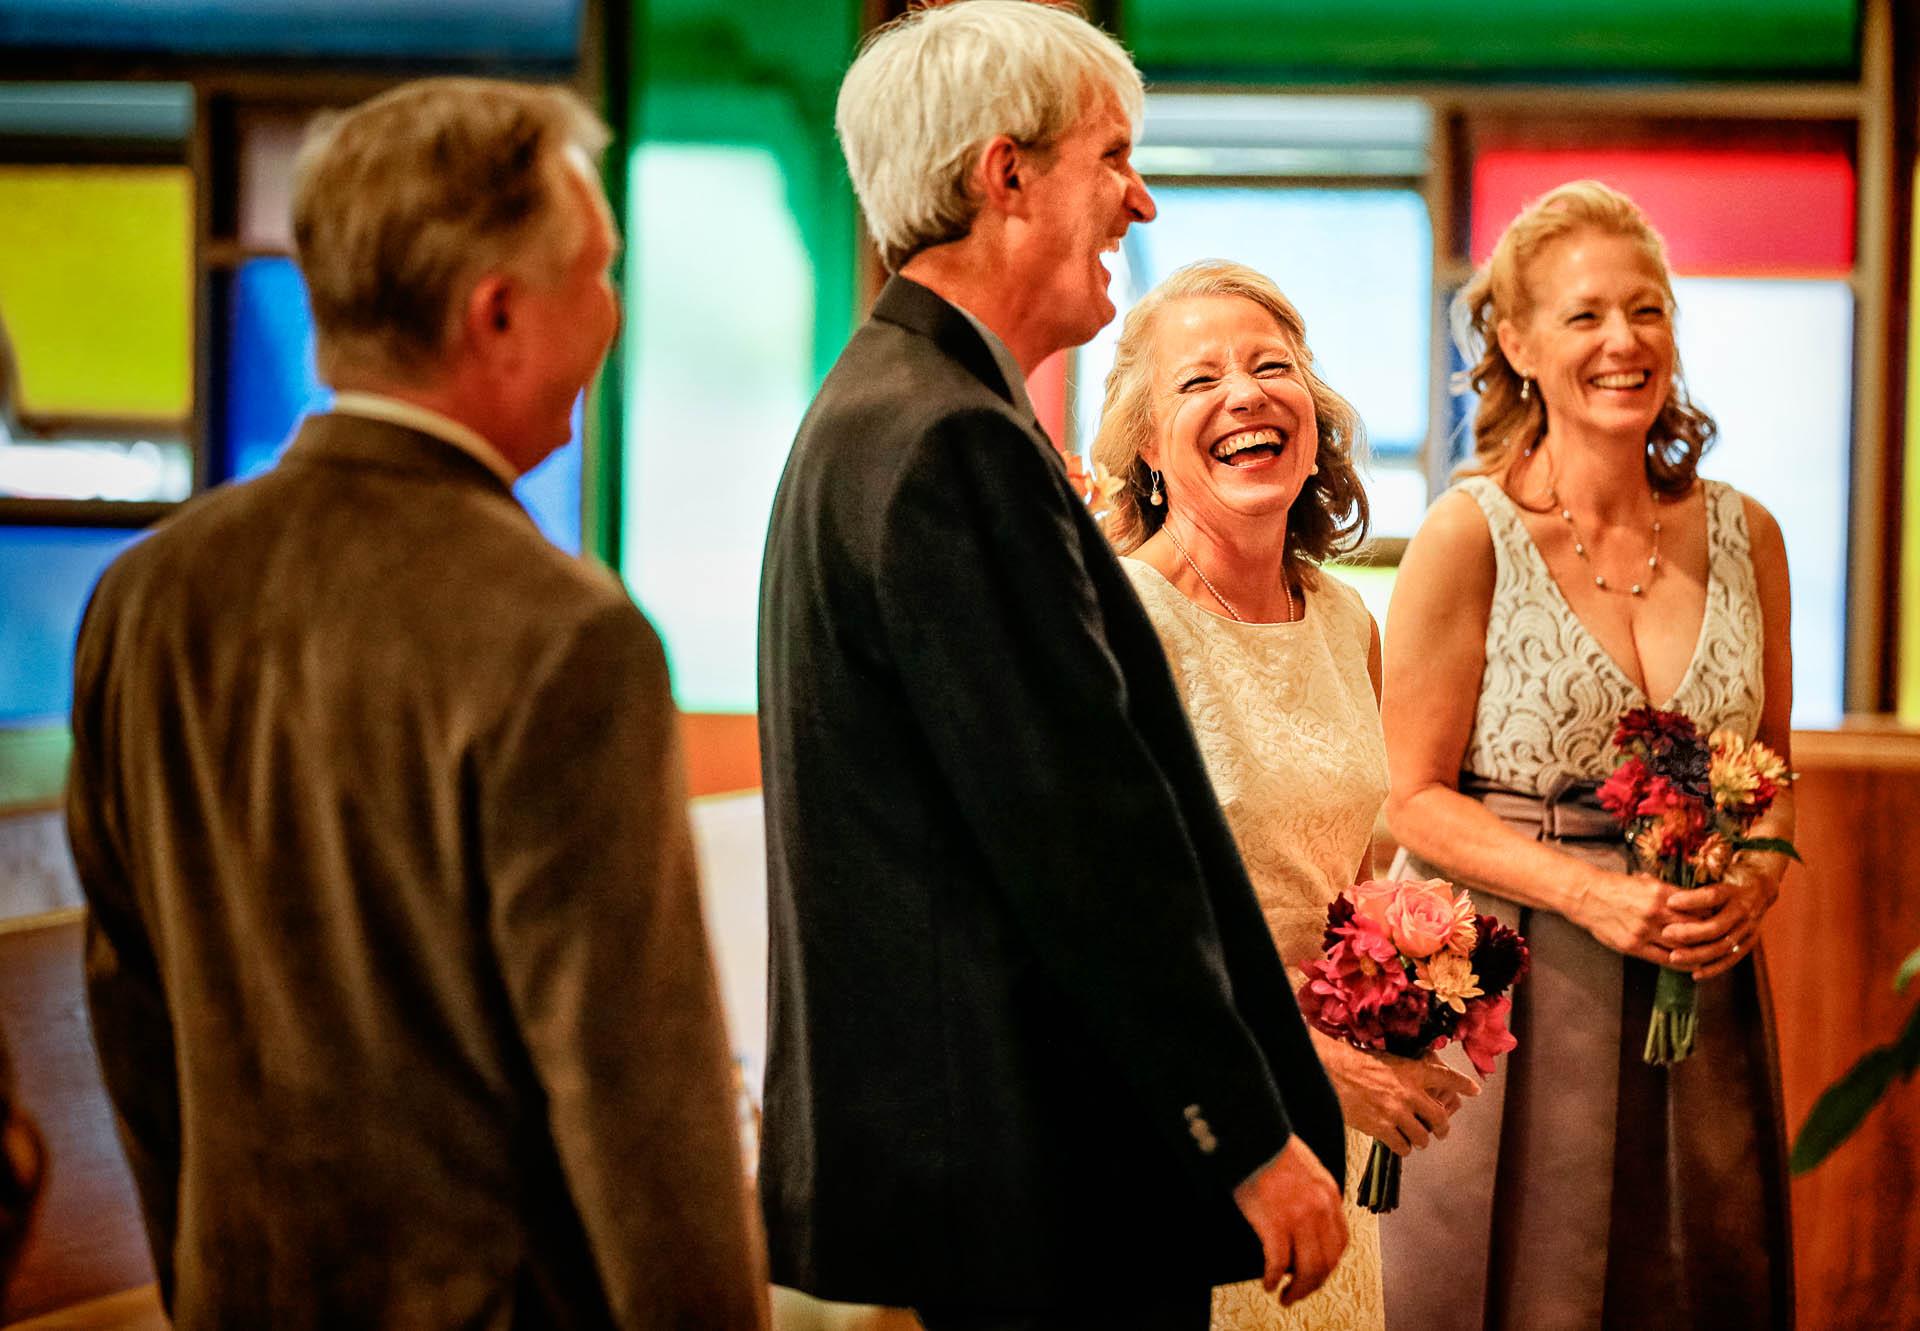 WEDDING-Karen-Mark-28Sep2014-MTO1061-Edit-Edit.jpg